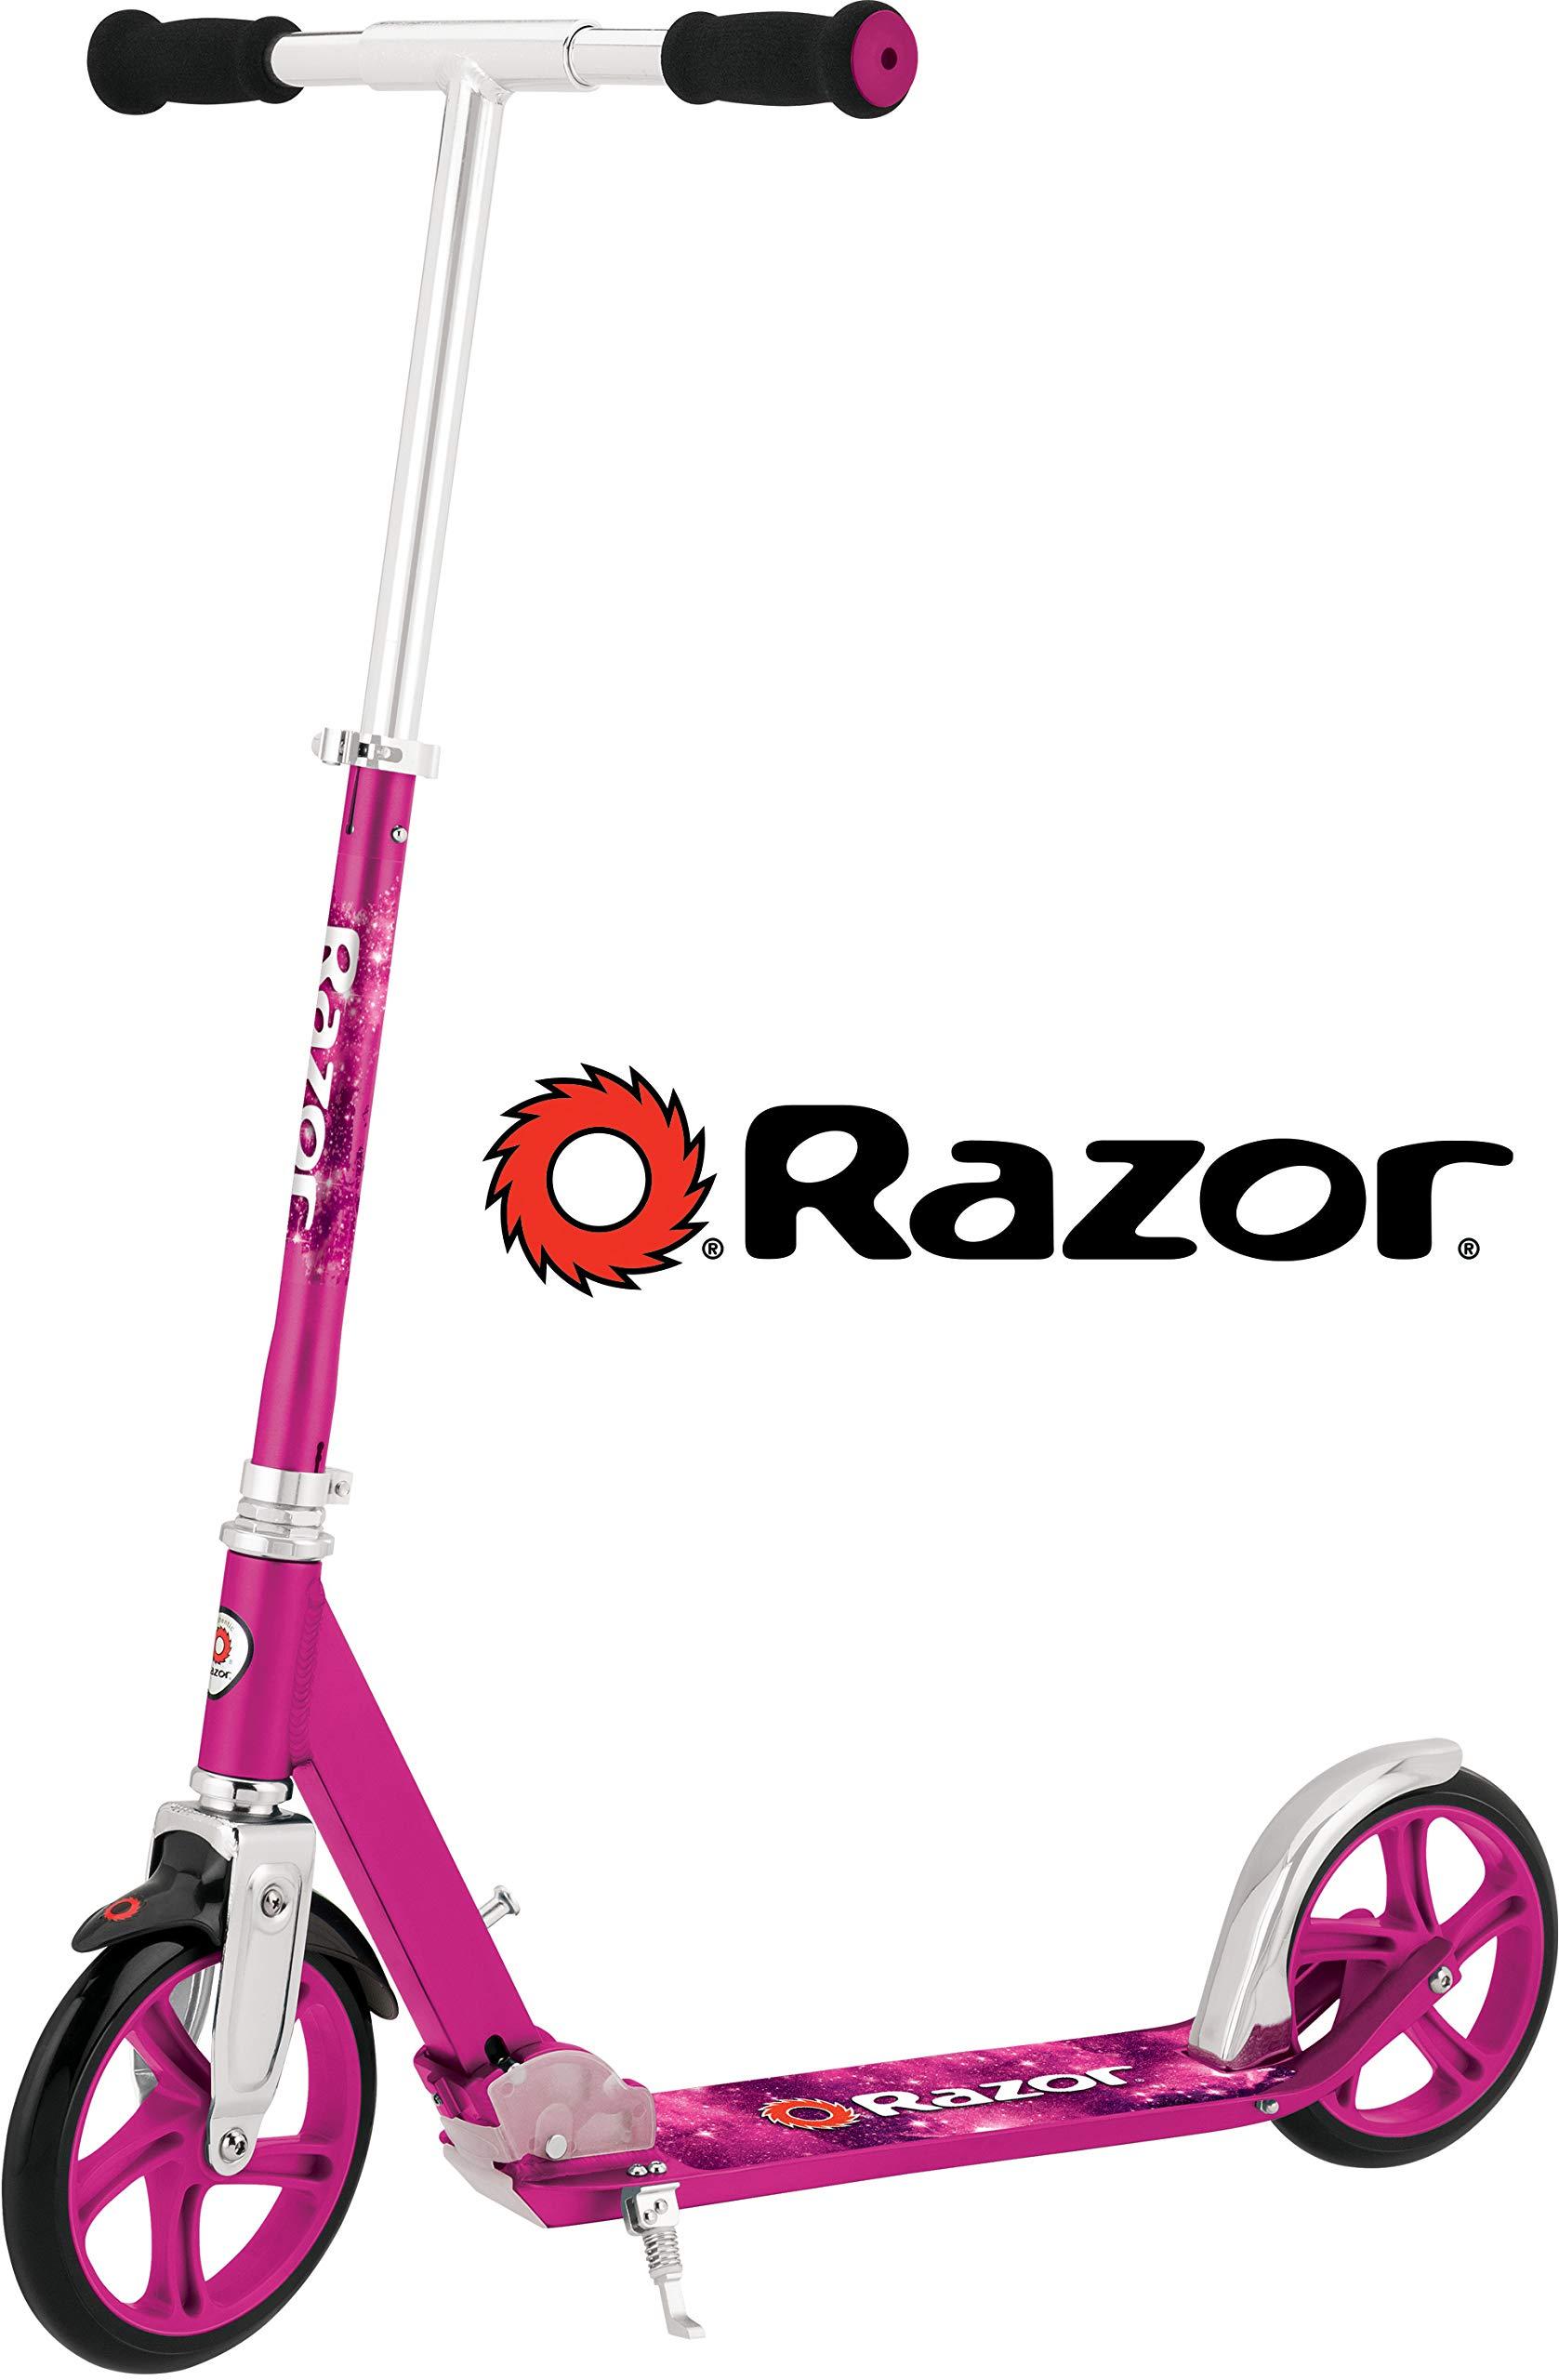 Razor A5 LUX Kick Scooter - Pink - FFP - 13013262 by Razor